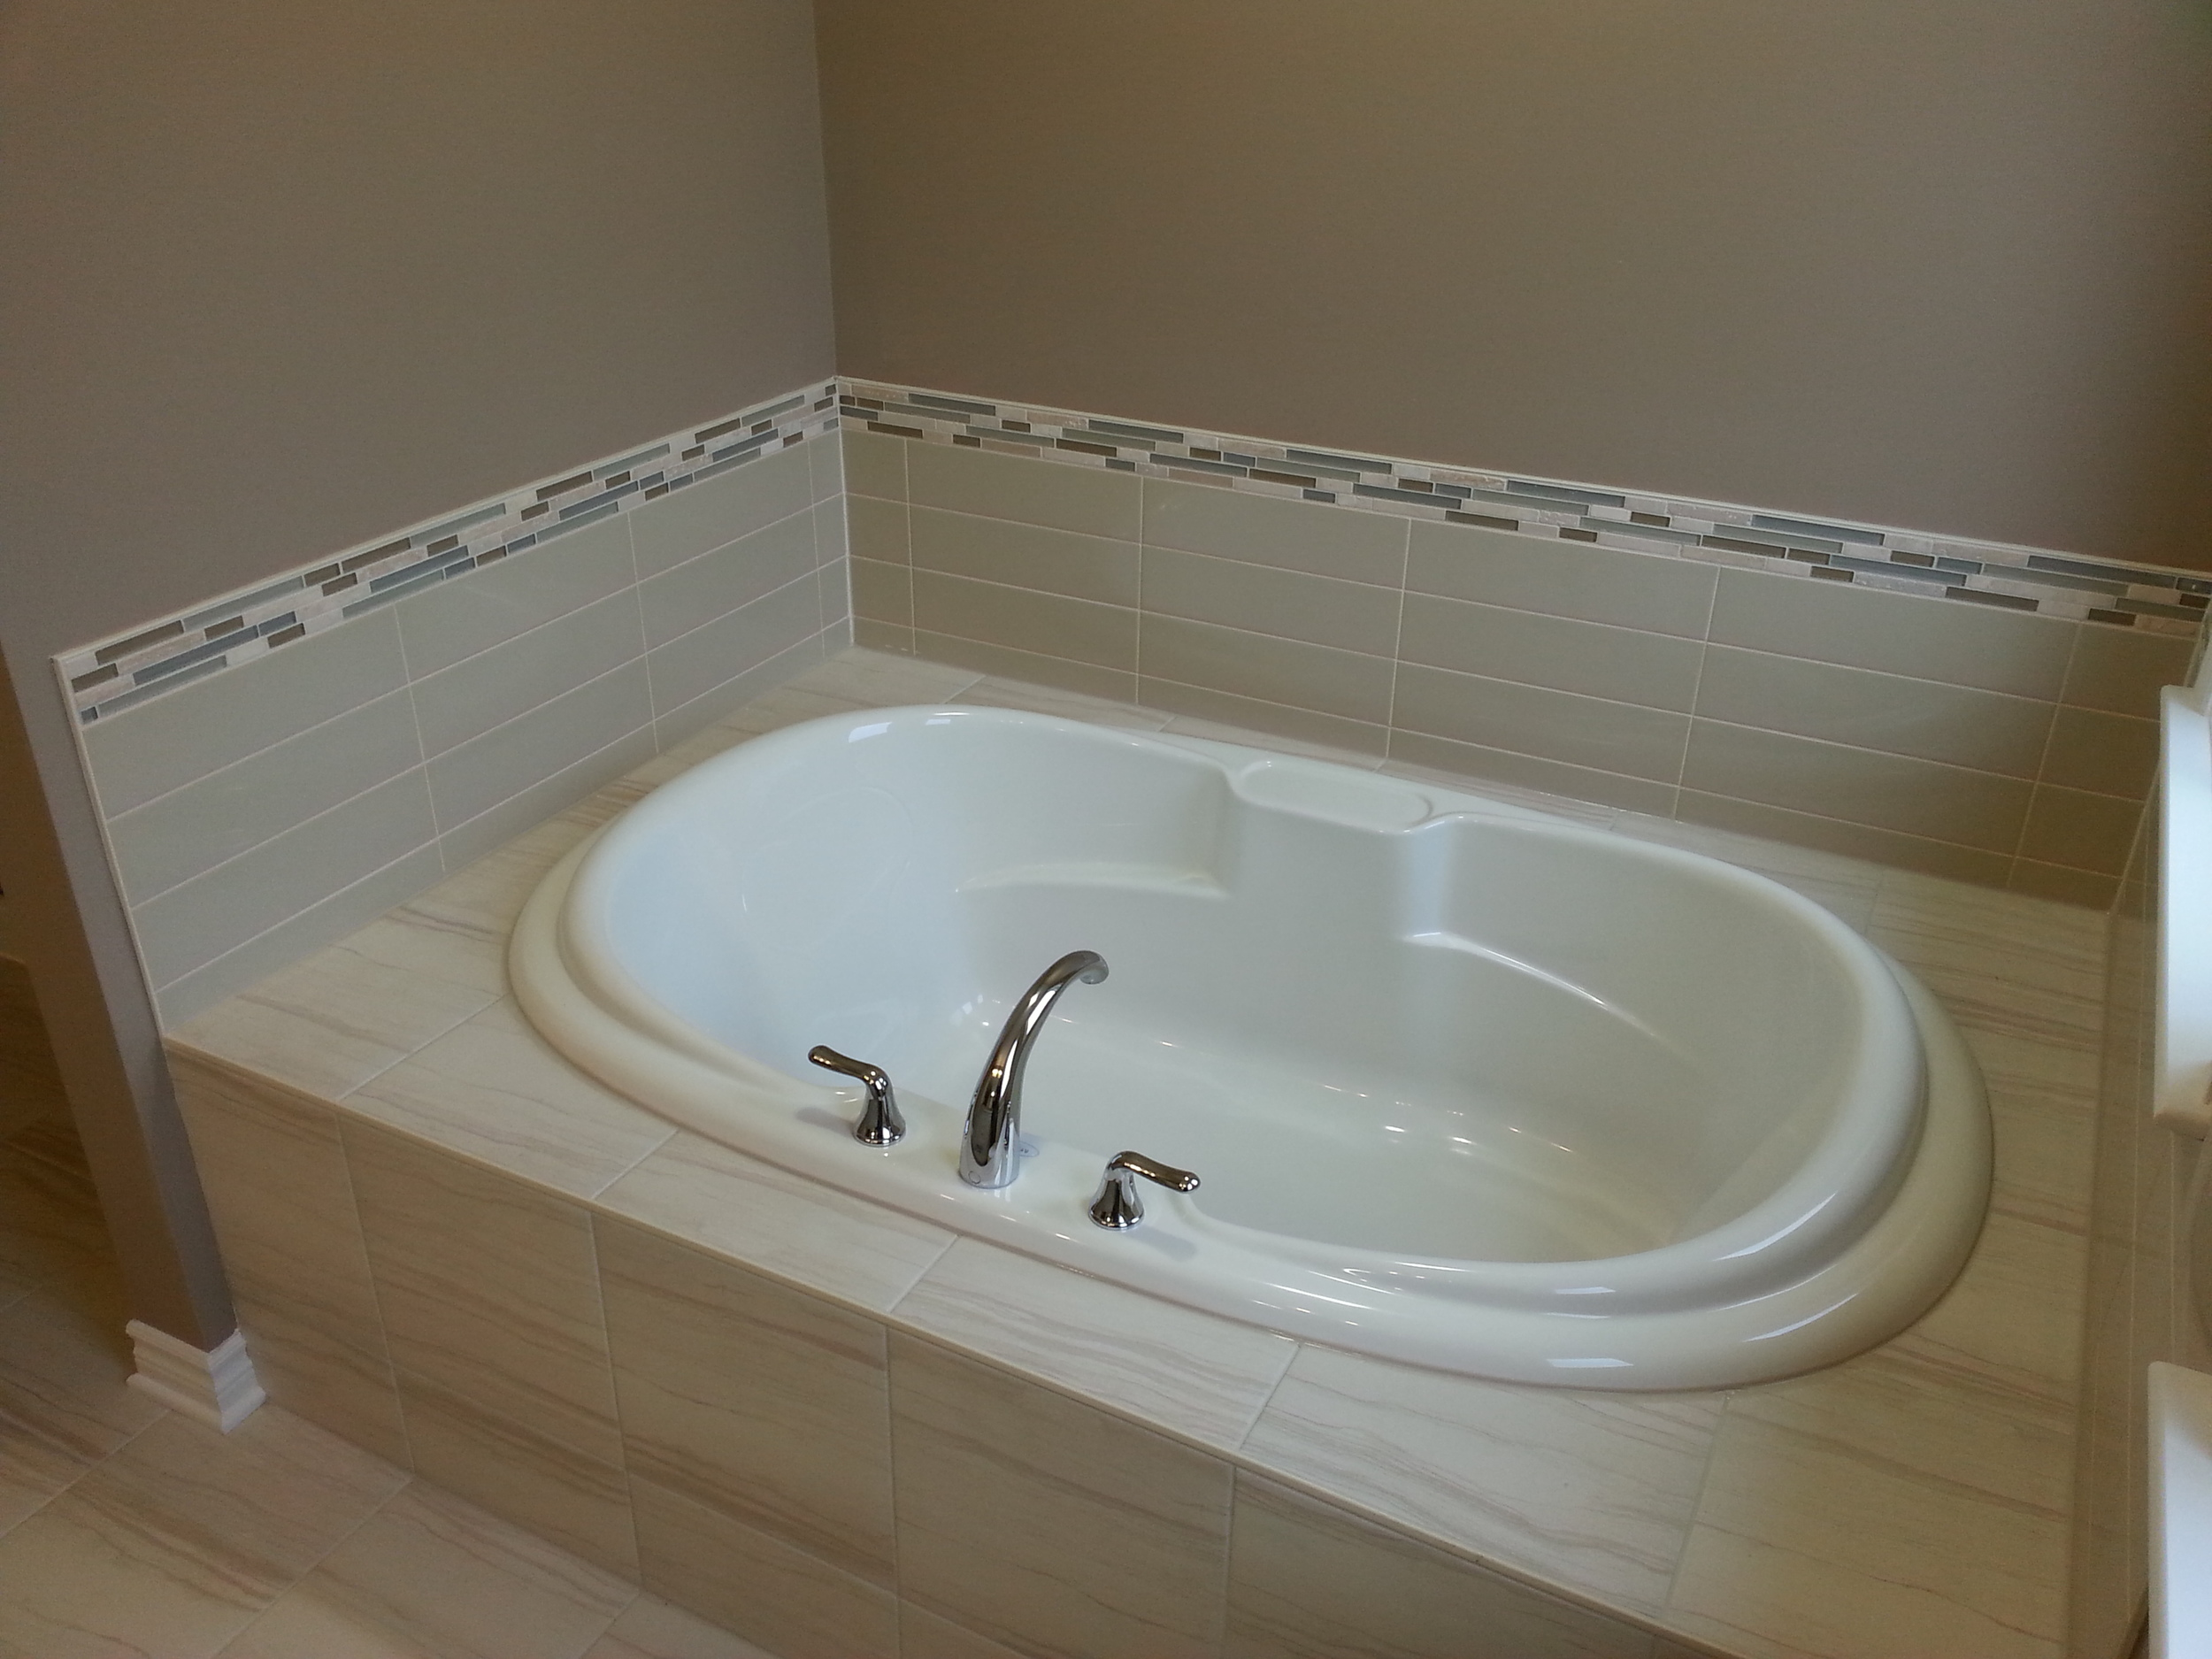 Tile Contractor Work - Shower & Bath Tubs (6).jpg